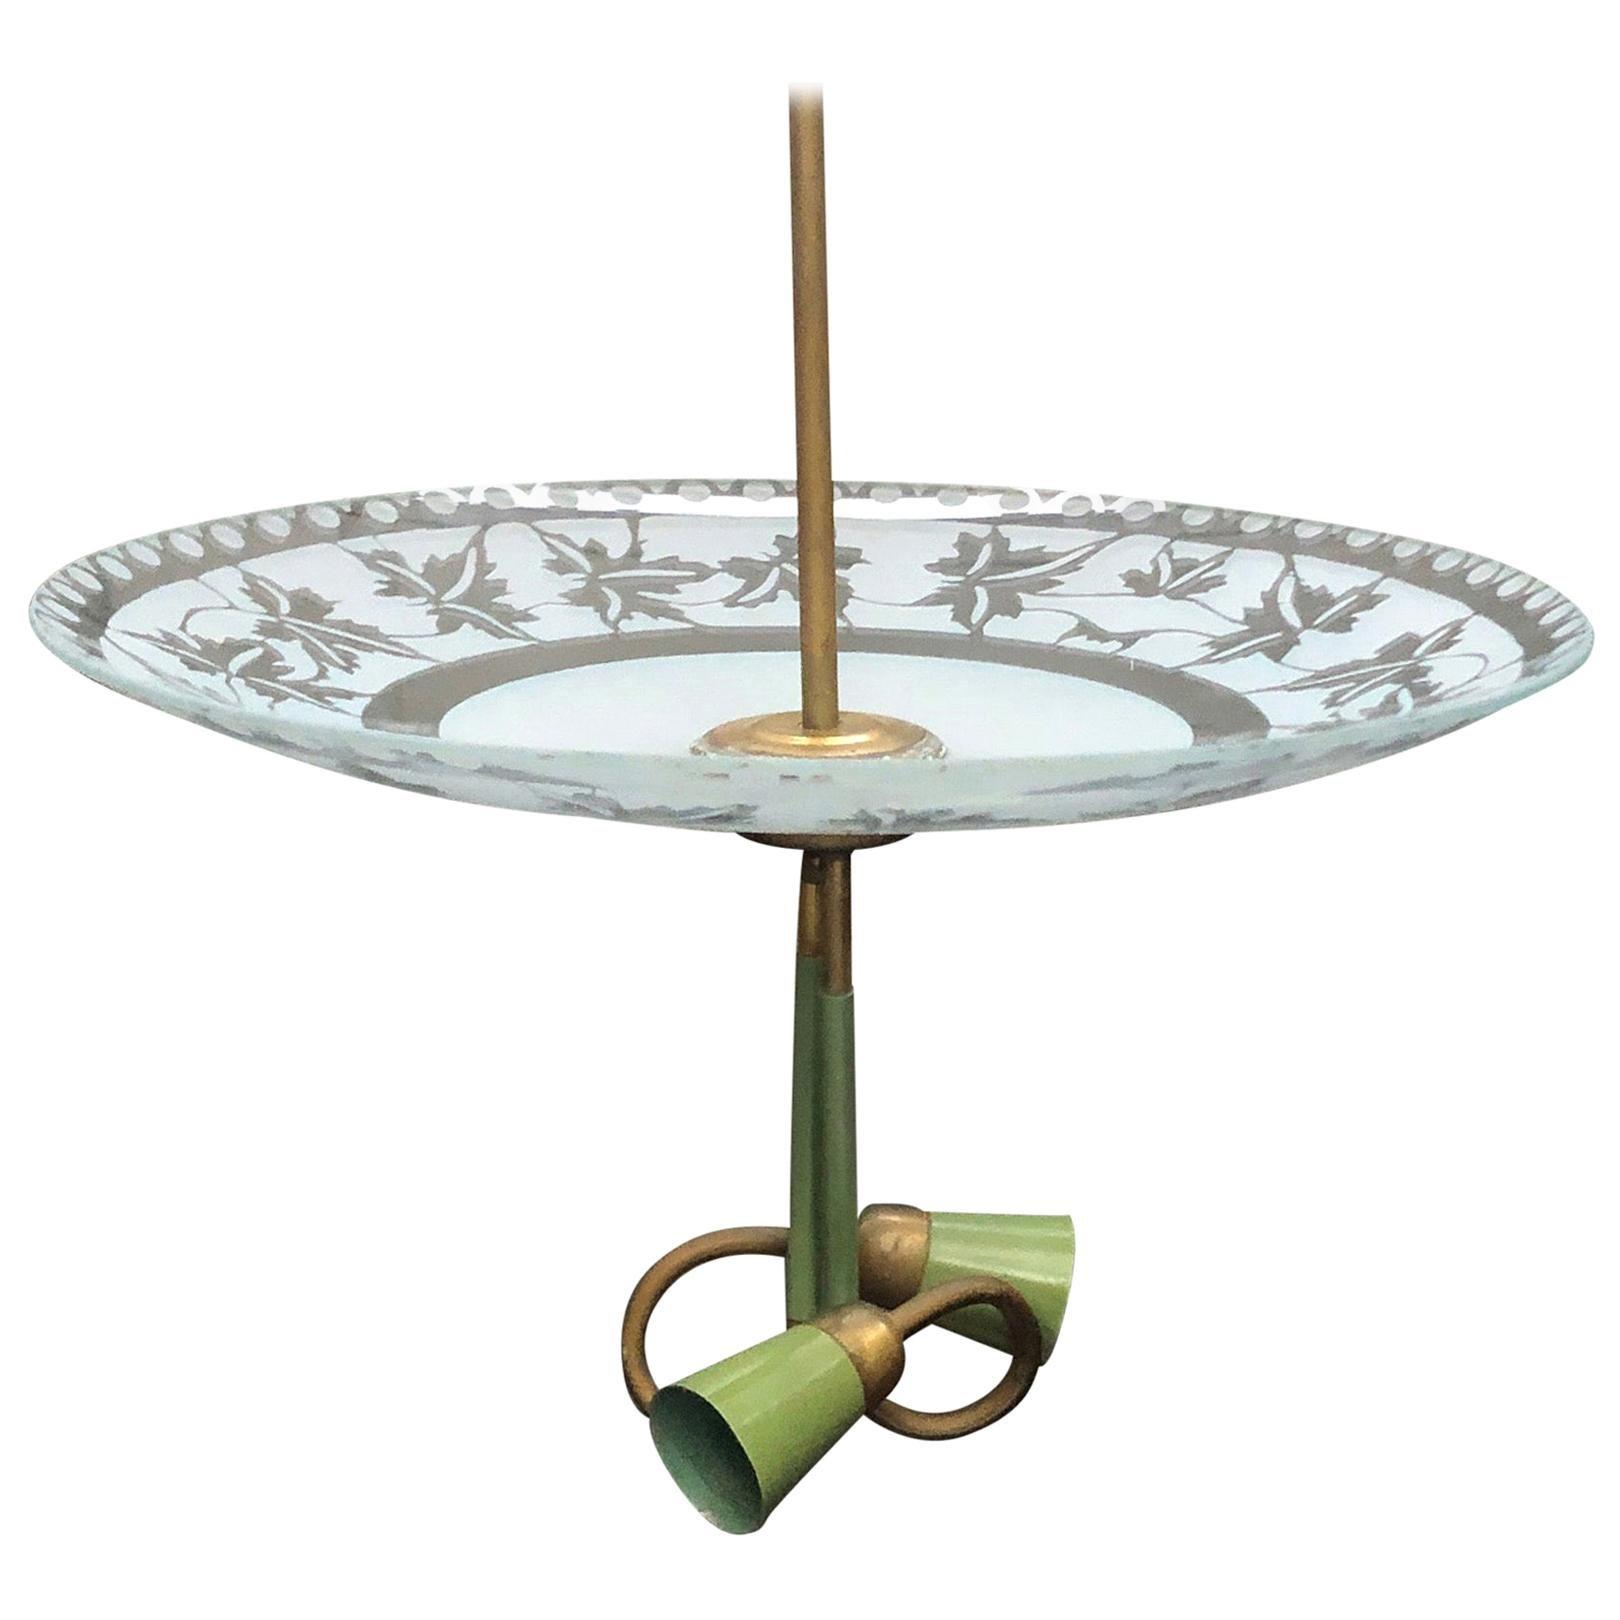 1950S Stilnovo Mid-Century Modern Brass and Glass Pendant